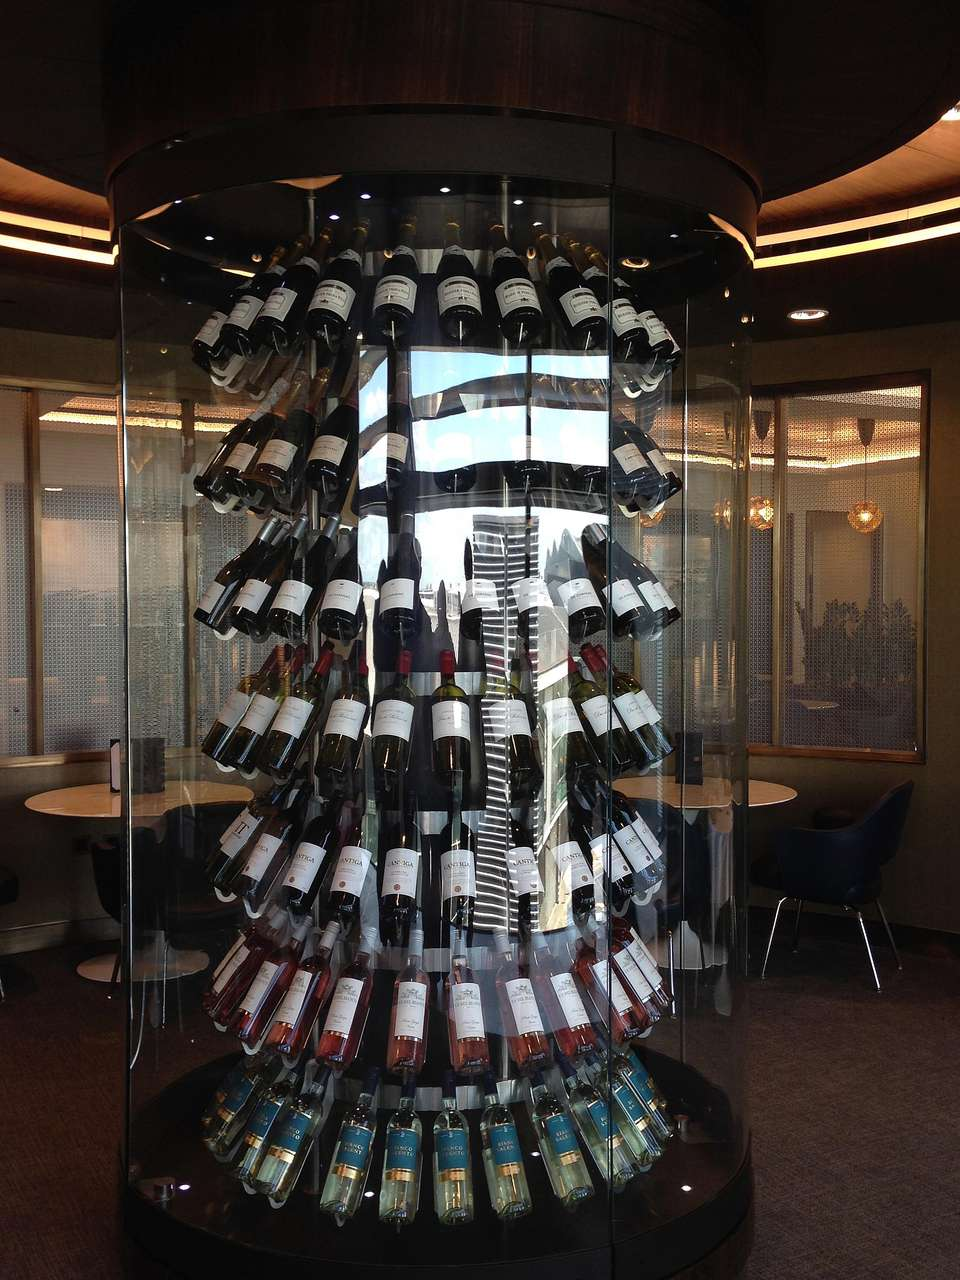 Global-wine-rack-BW.jpg